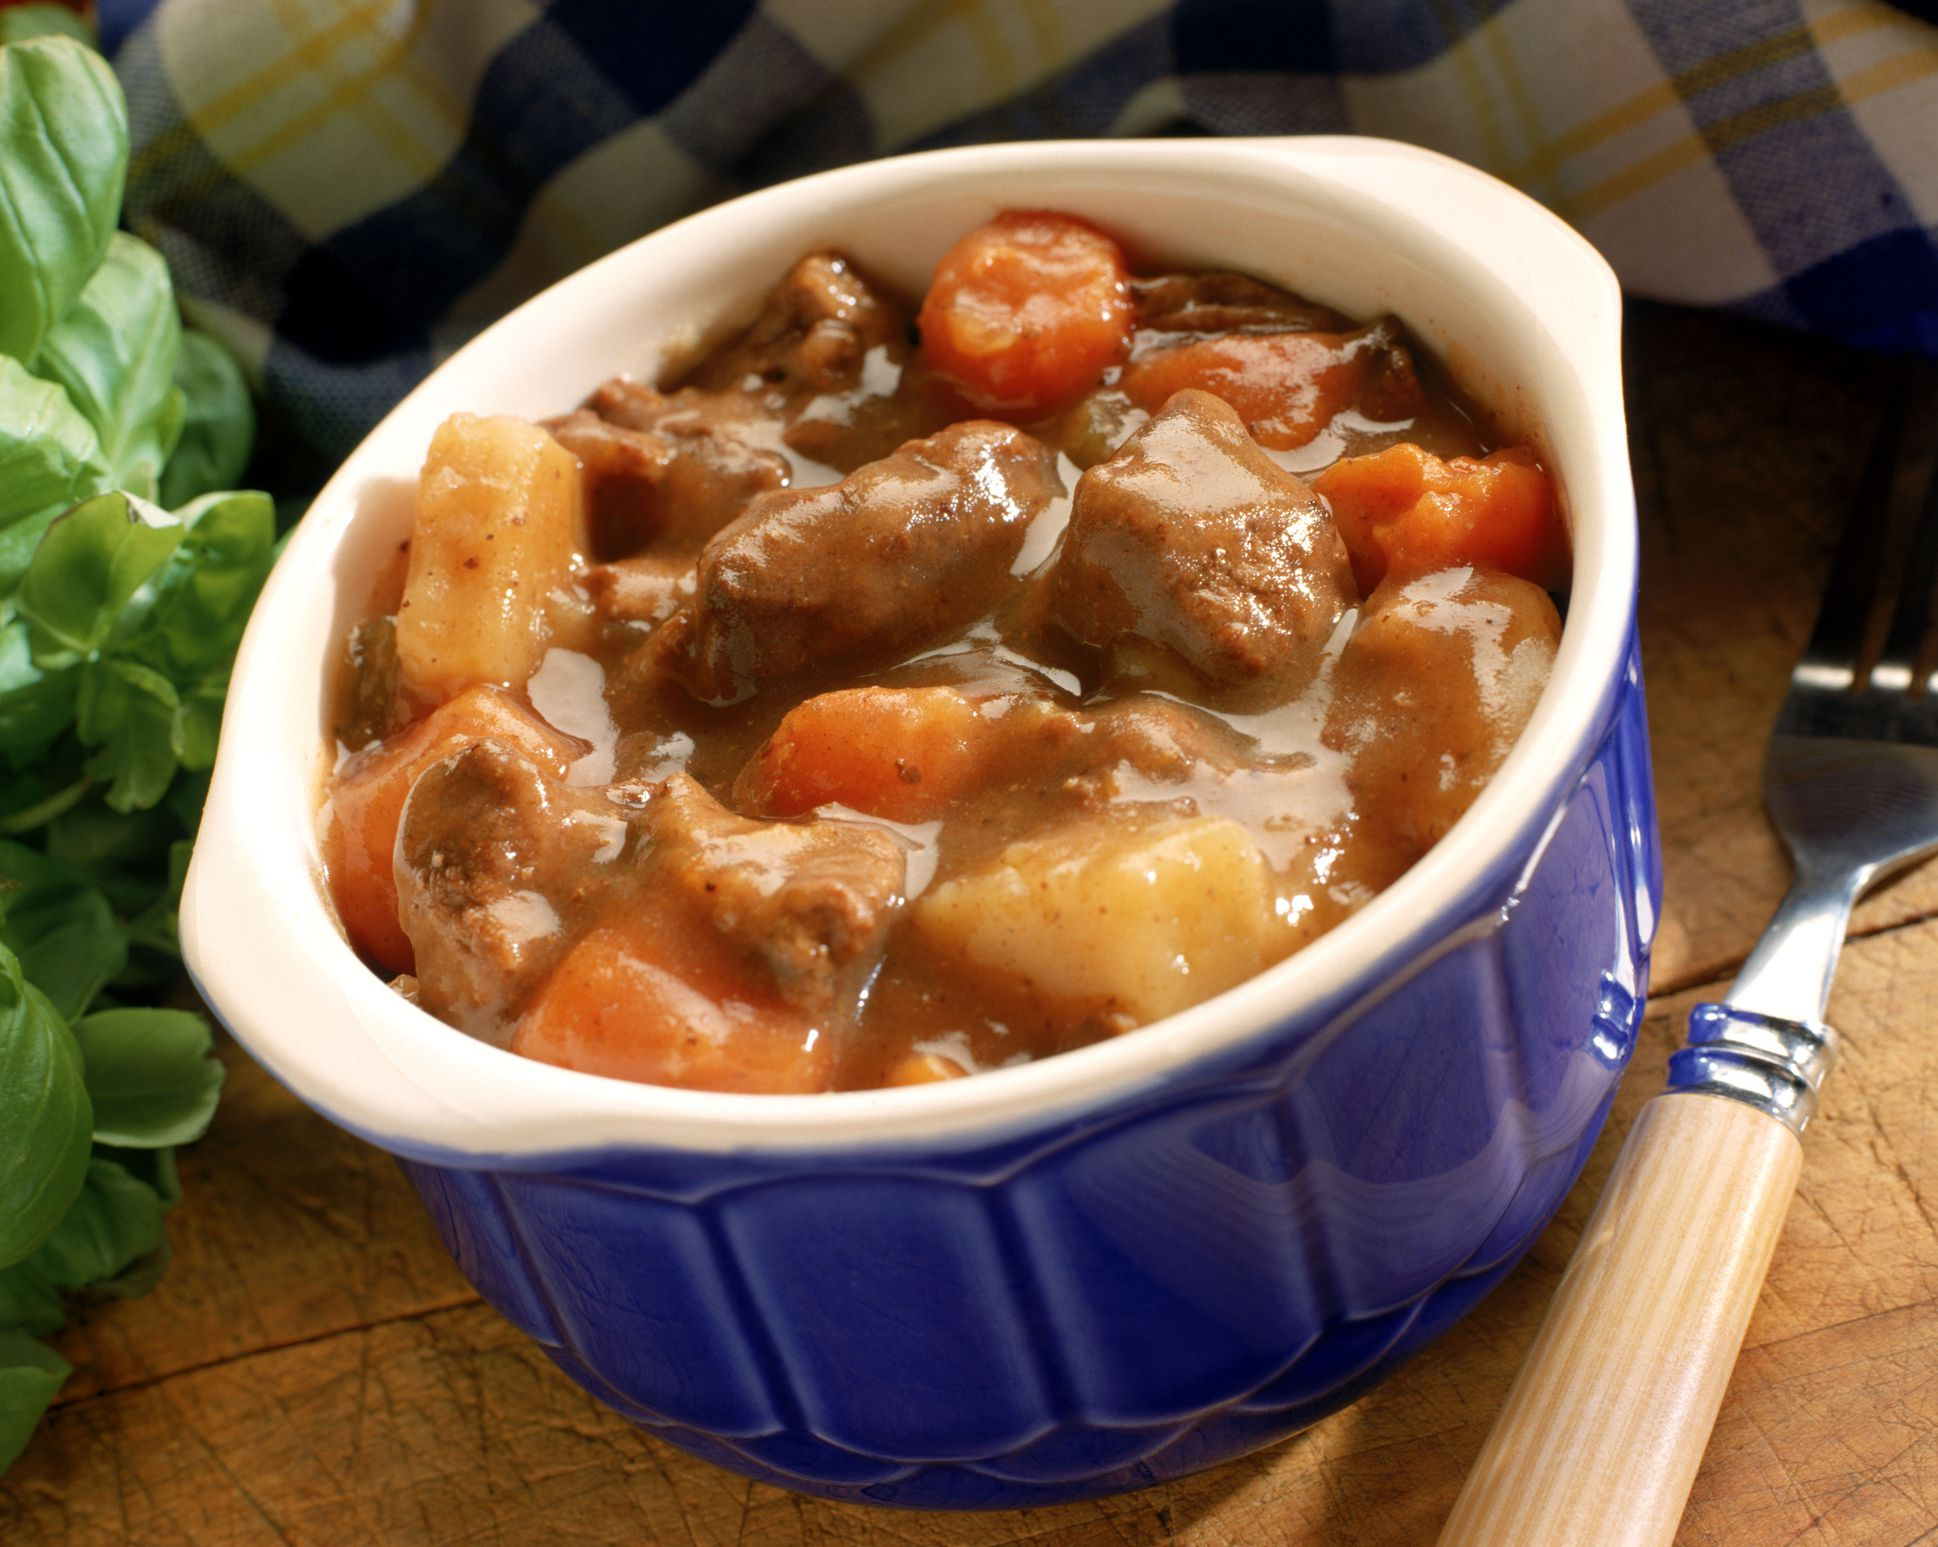 Crockpot Cider Beef Stew Recipe